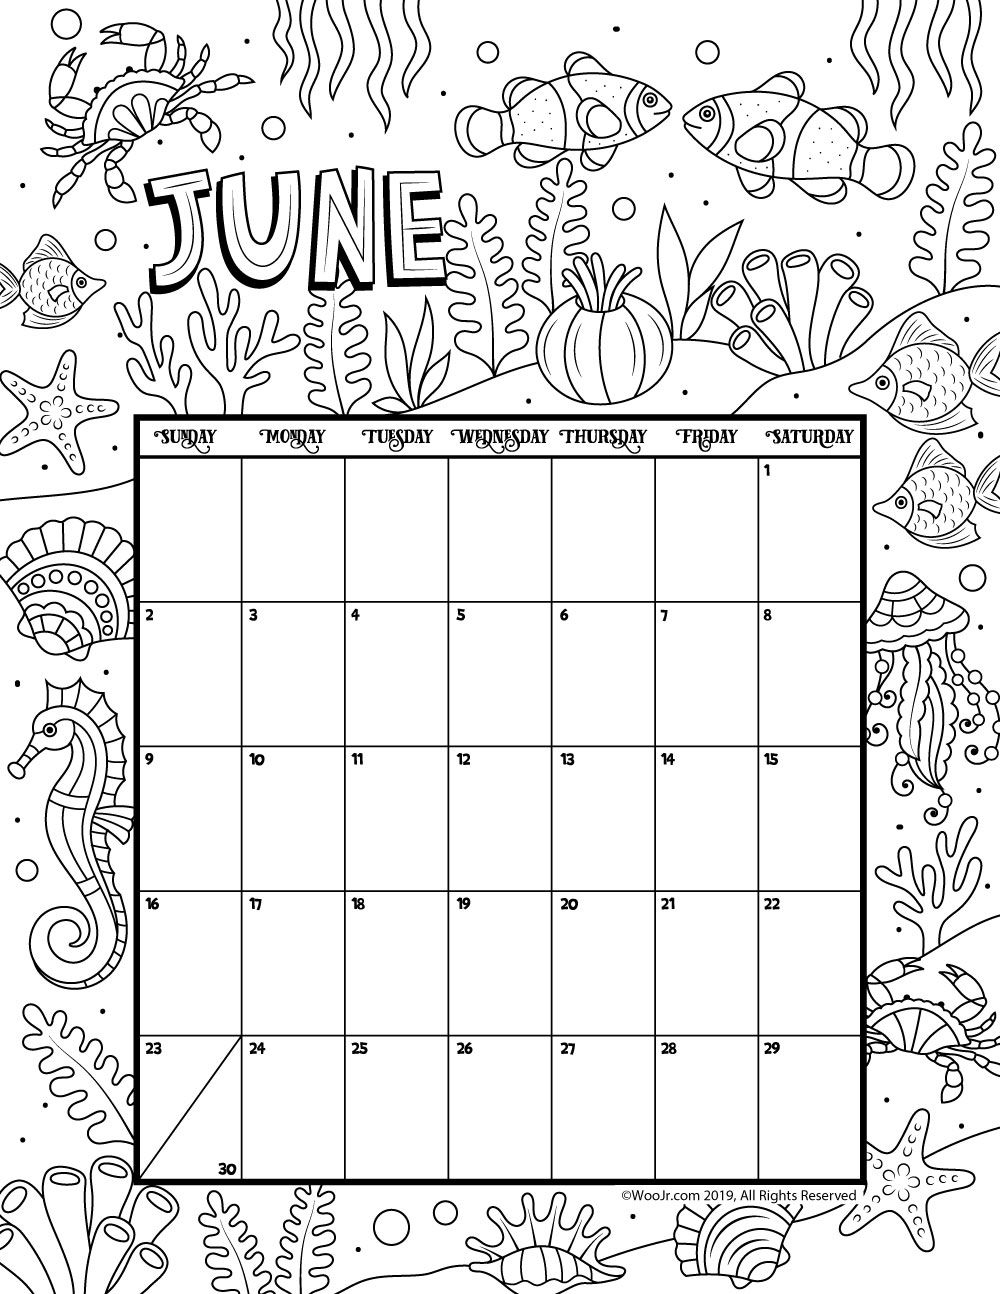 Modern Minimal April 2019 Calendar Bullet Journal t